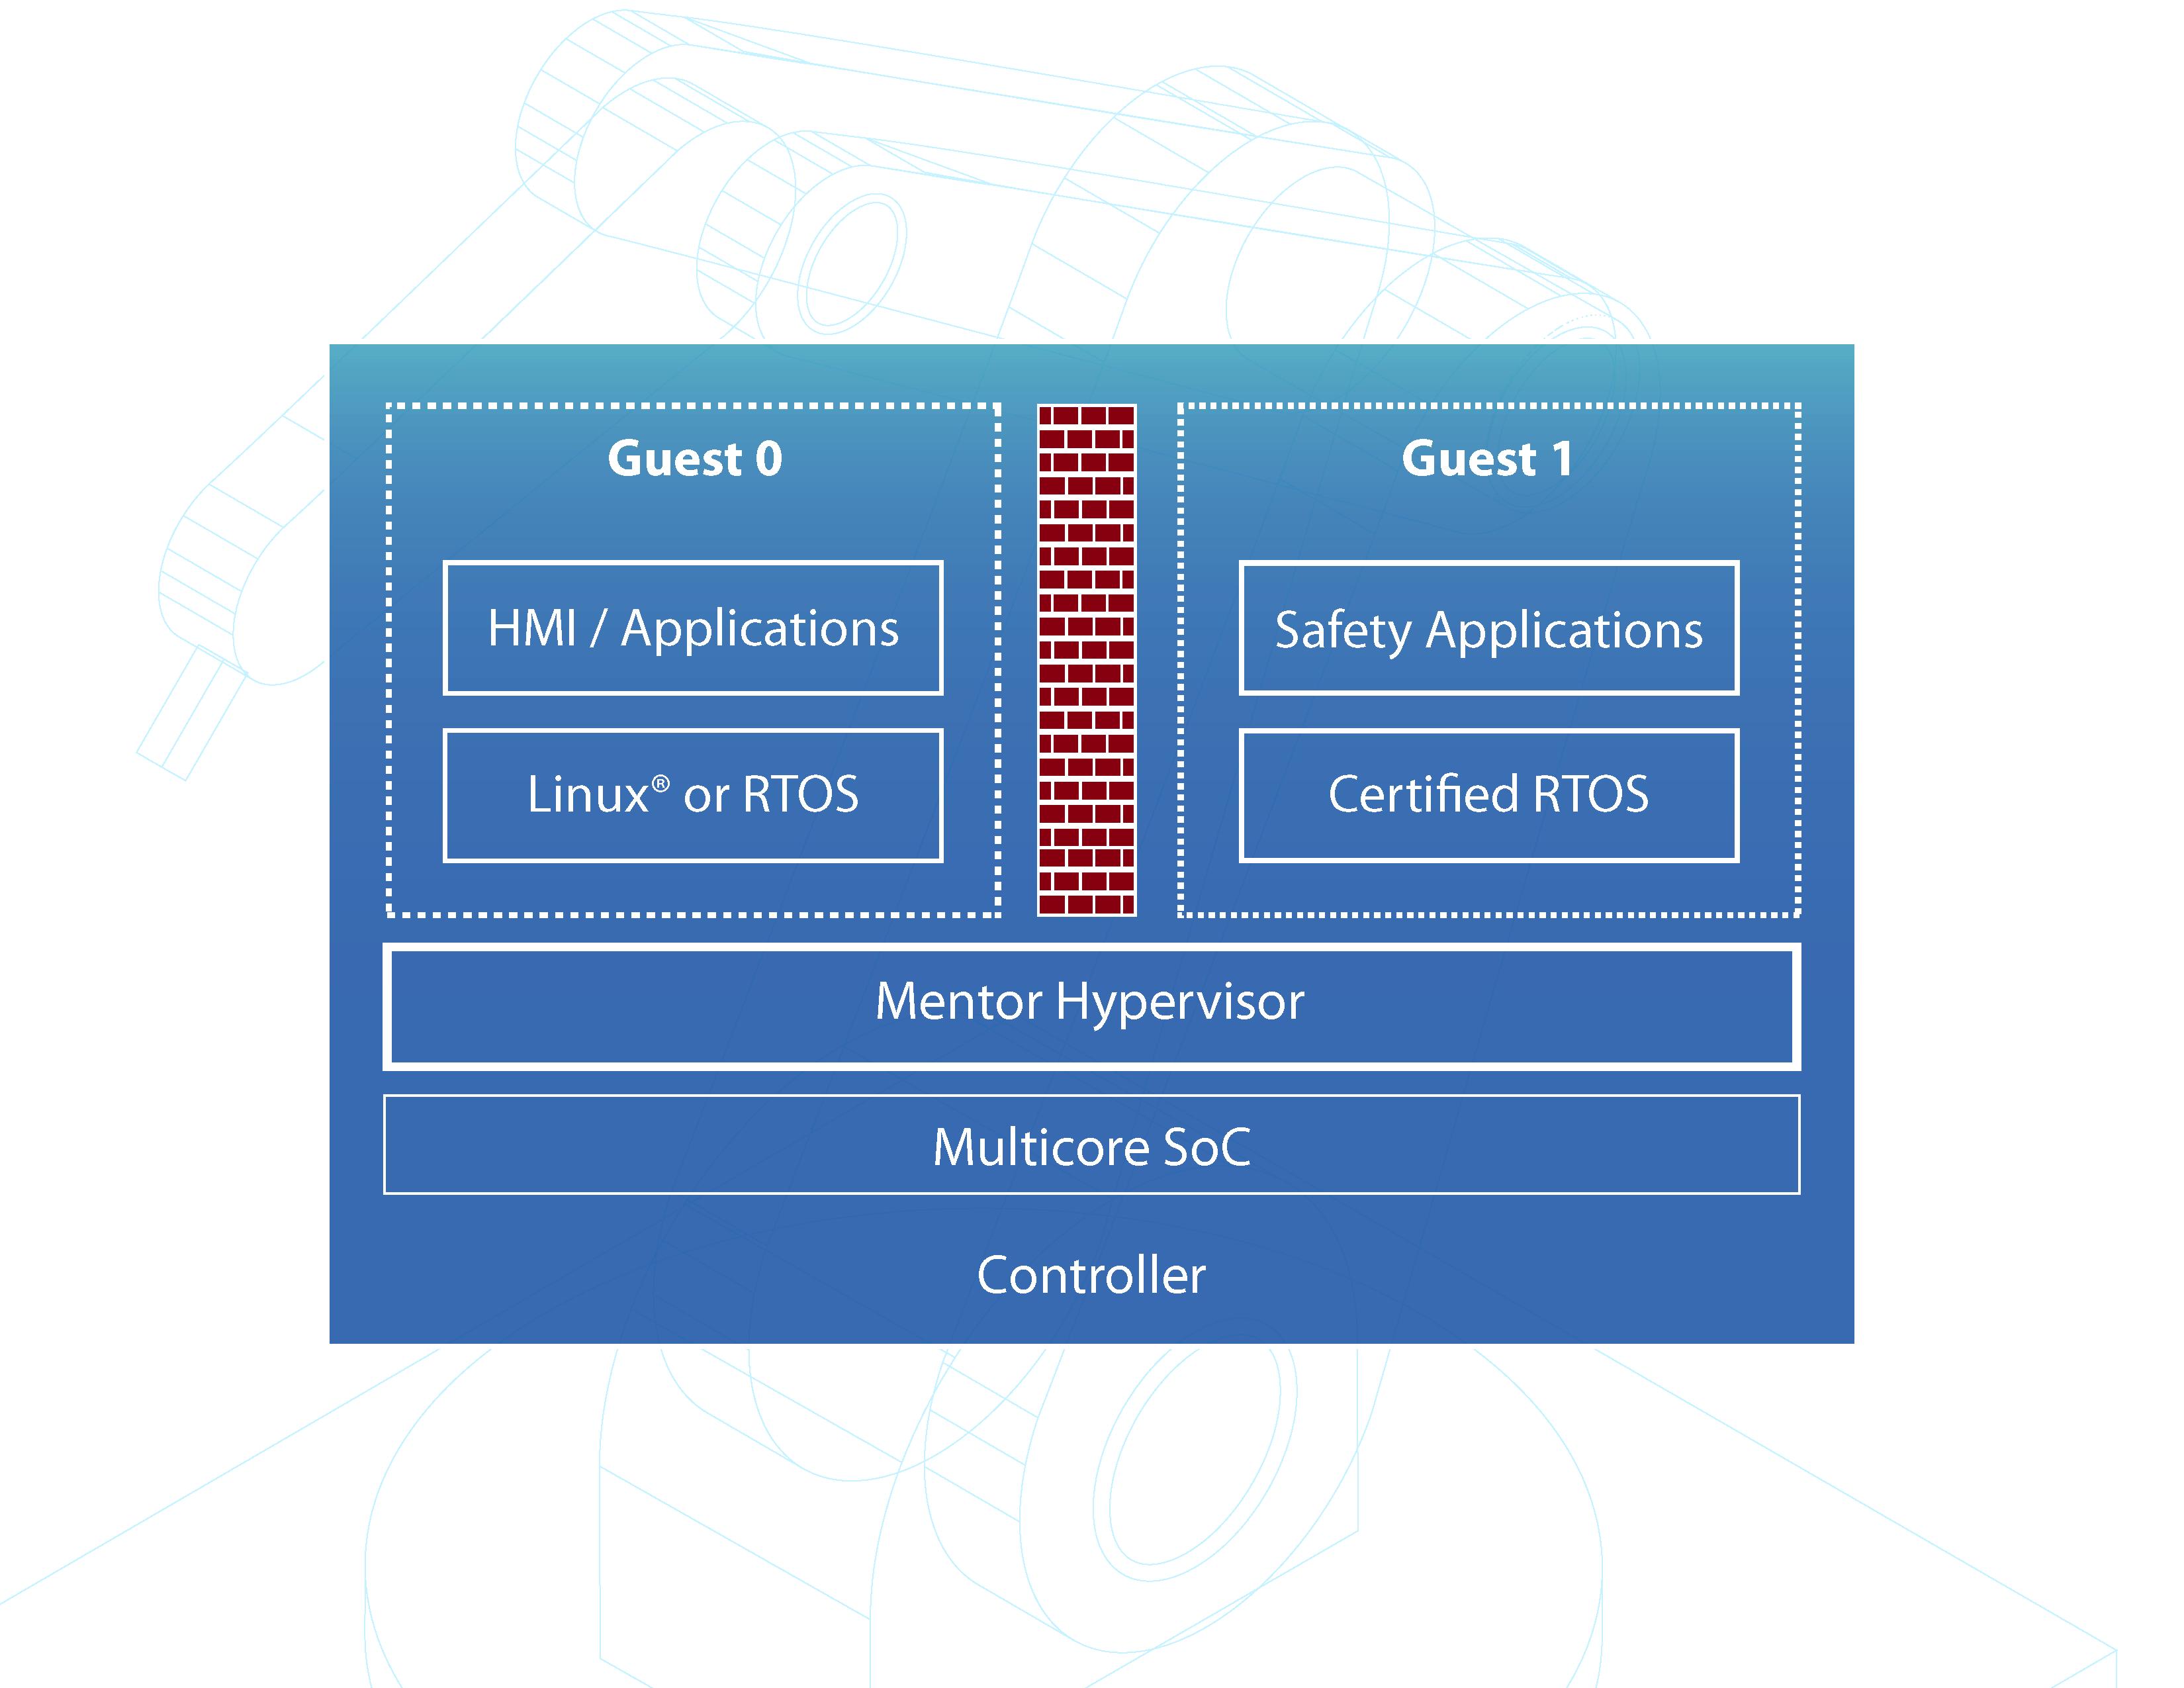 diagram of hypervisor light sensor wiring developing a mixed safety critical iiot robotic arm ee